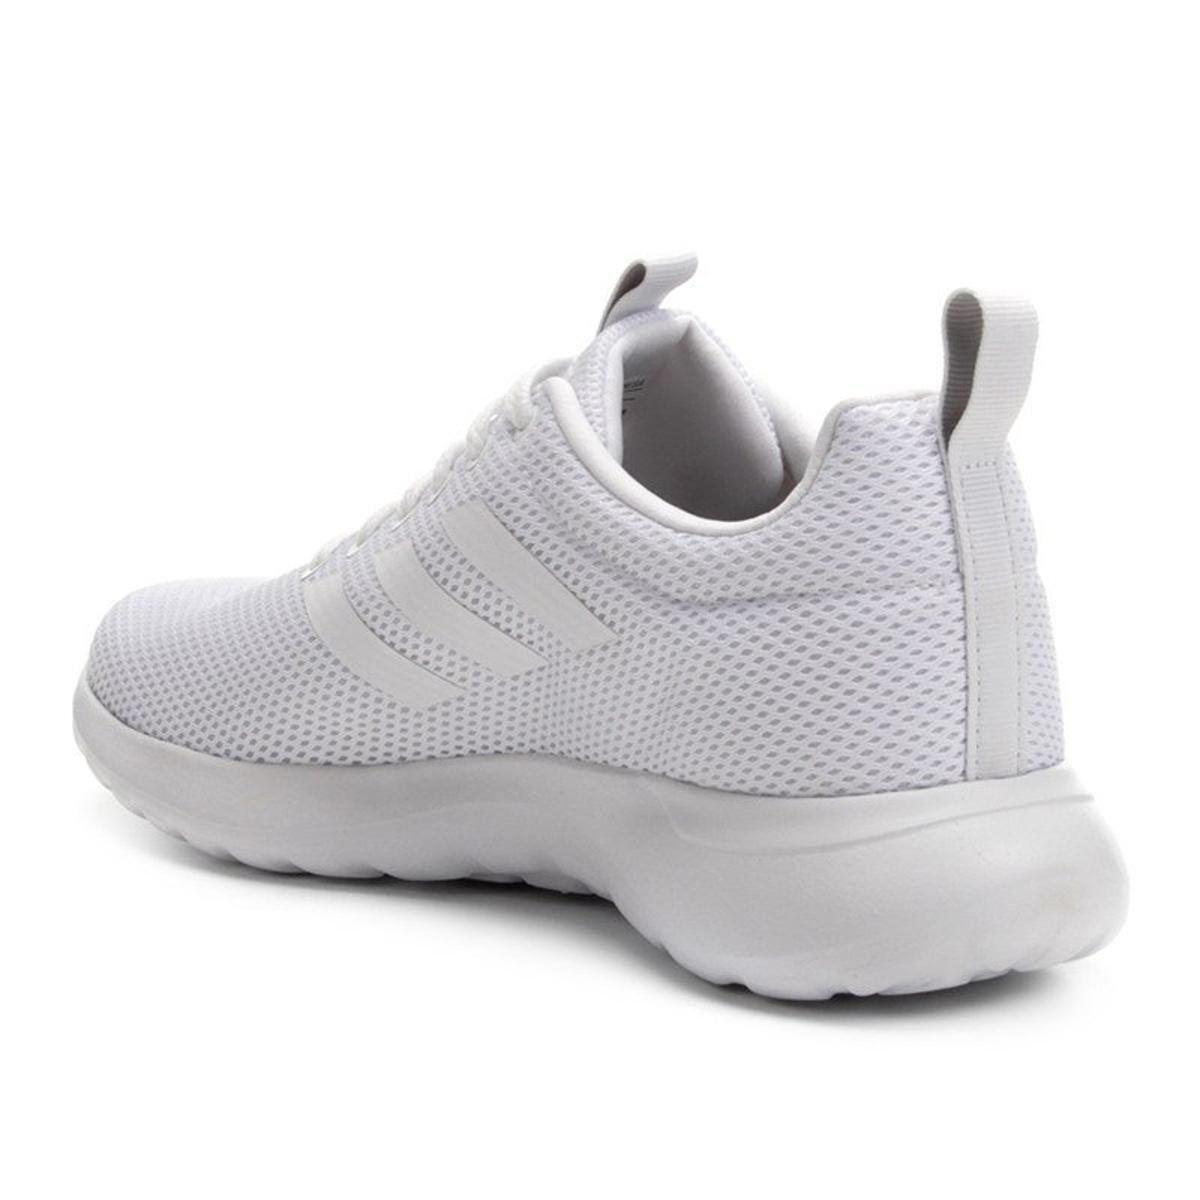 2dee0b2bc5 Tênis Adidas Lite Racer CLN Masculino - Compre Agora